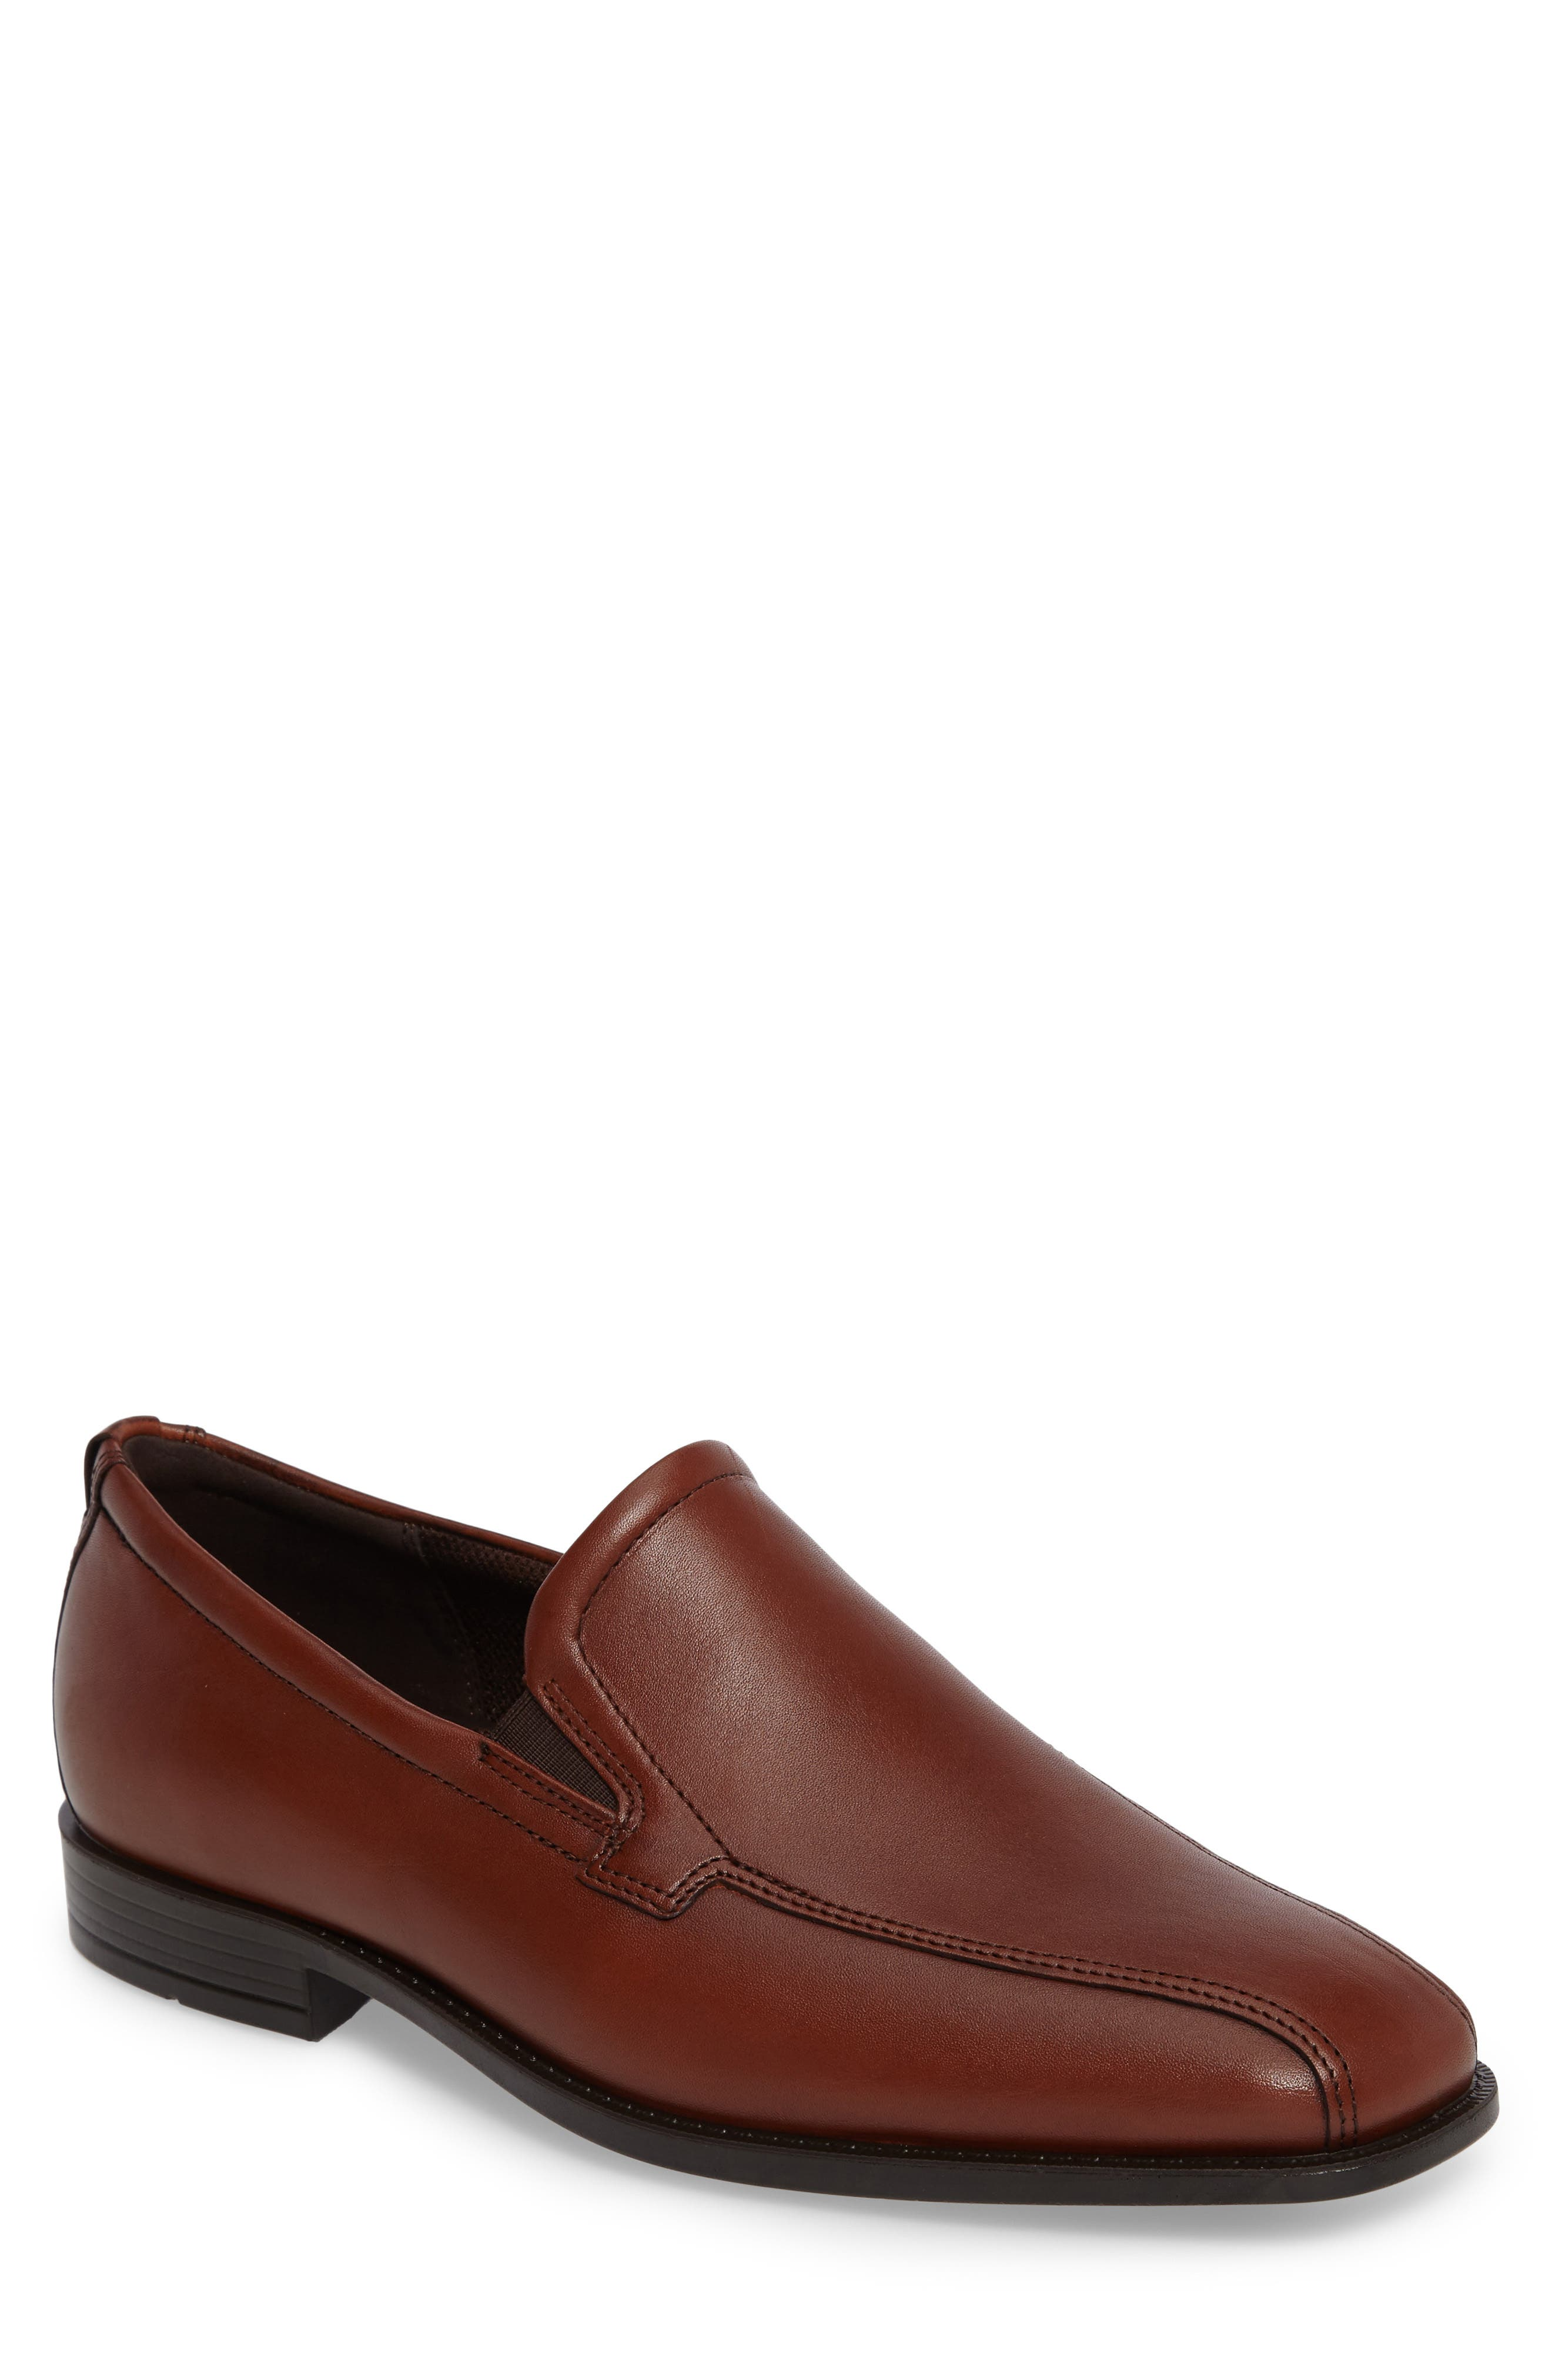 ECCO Edinburgh Venetian Loafer (Men)